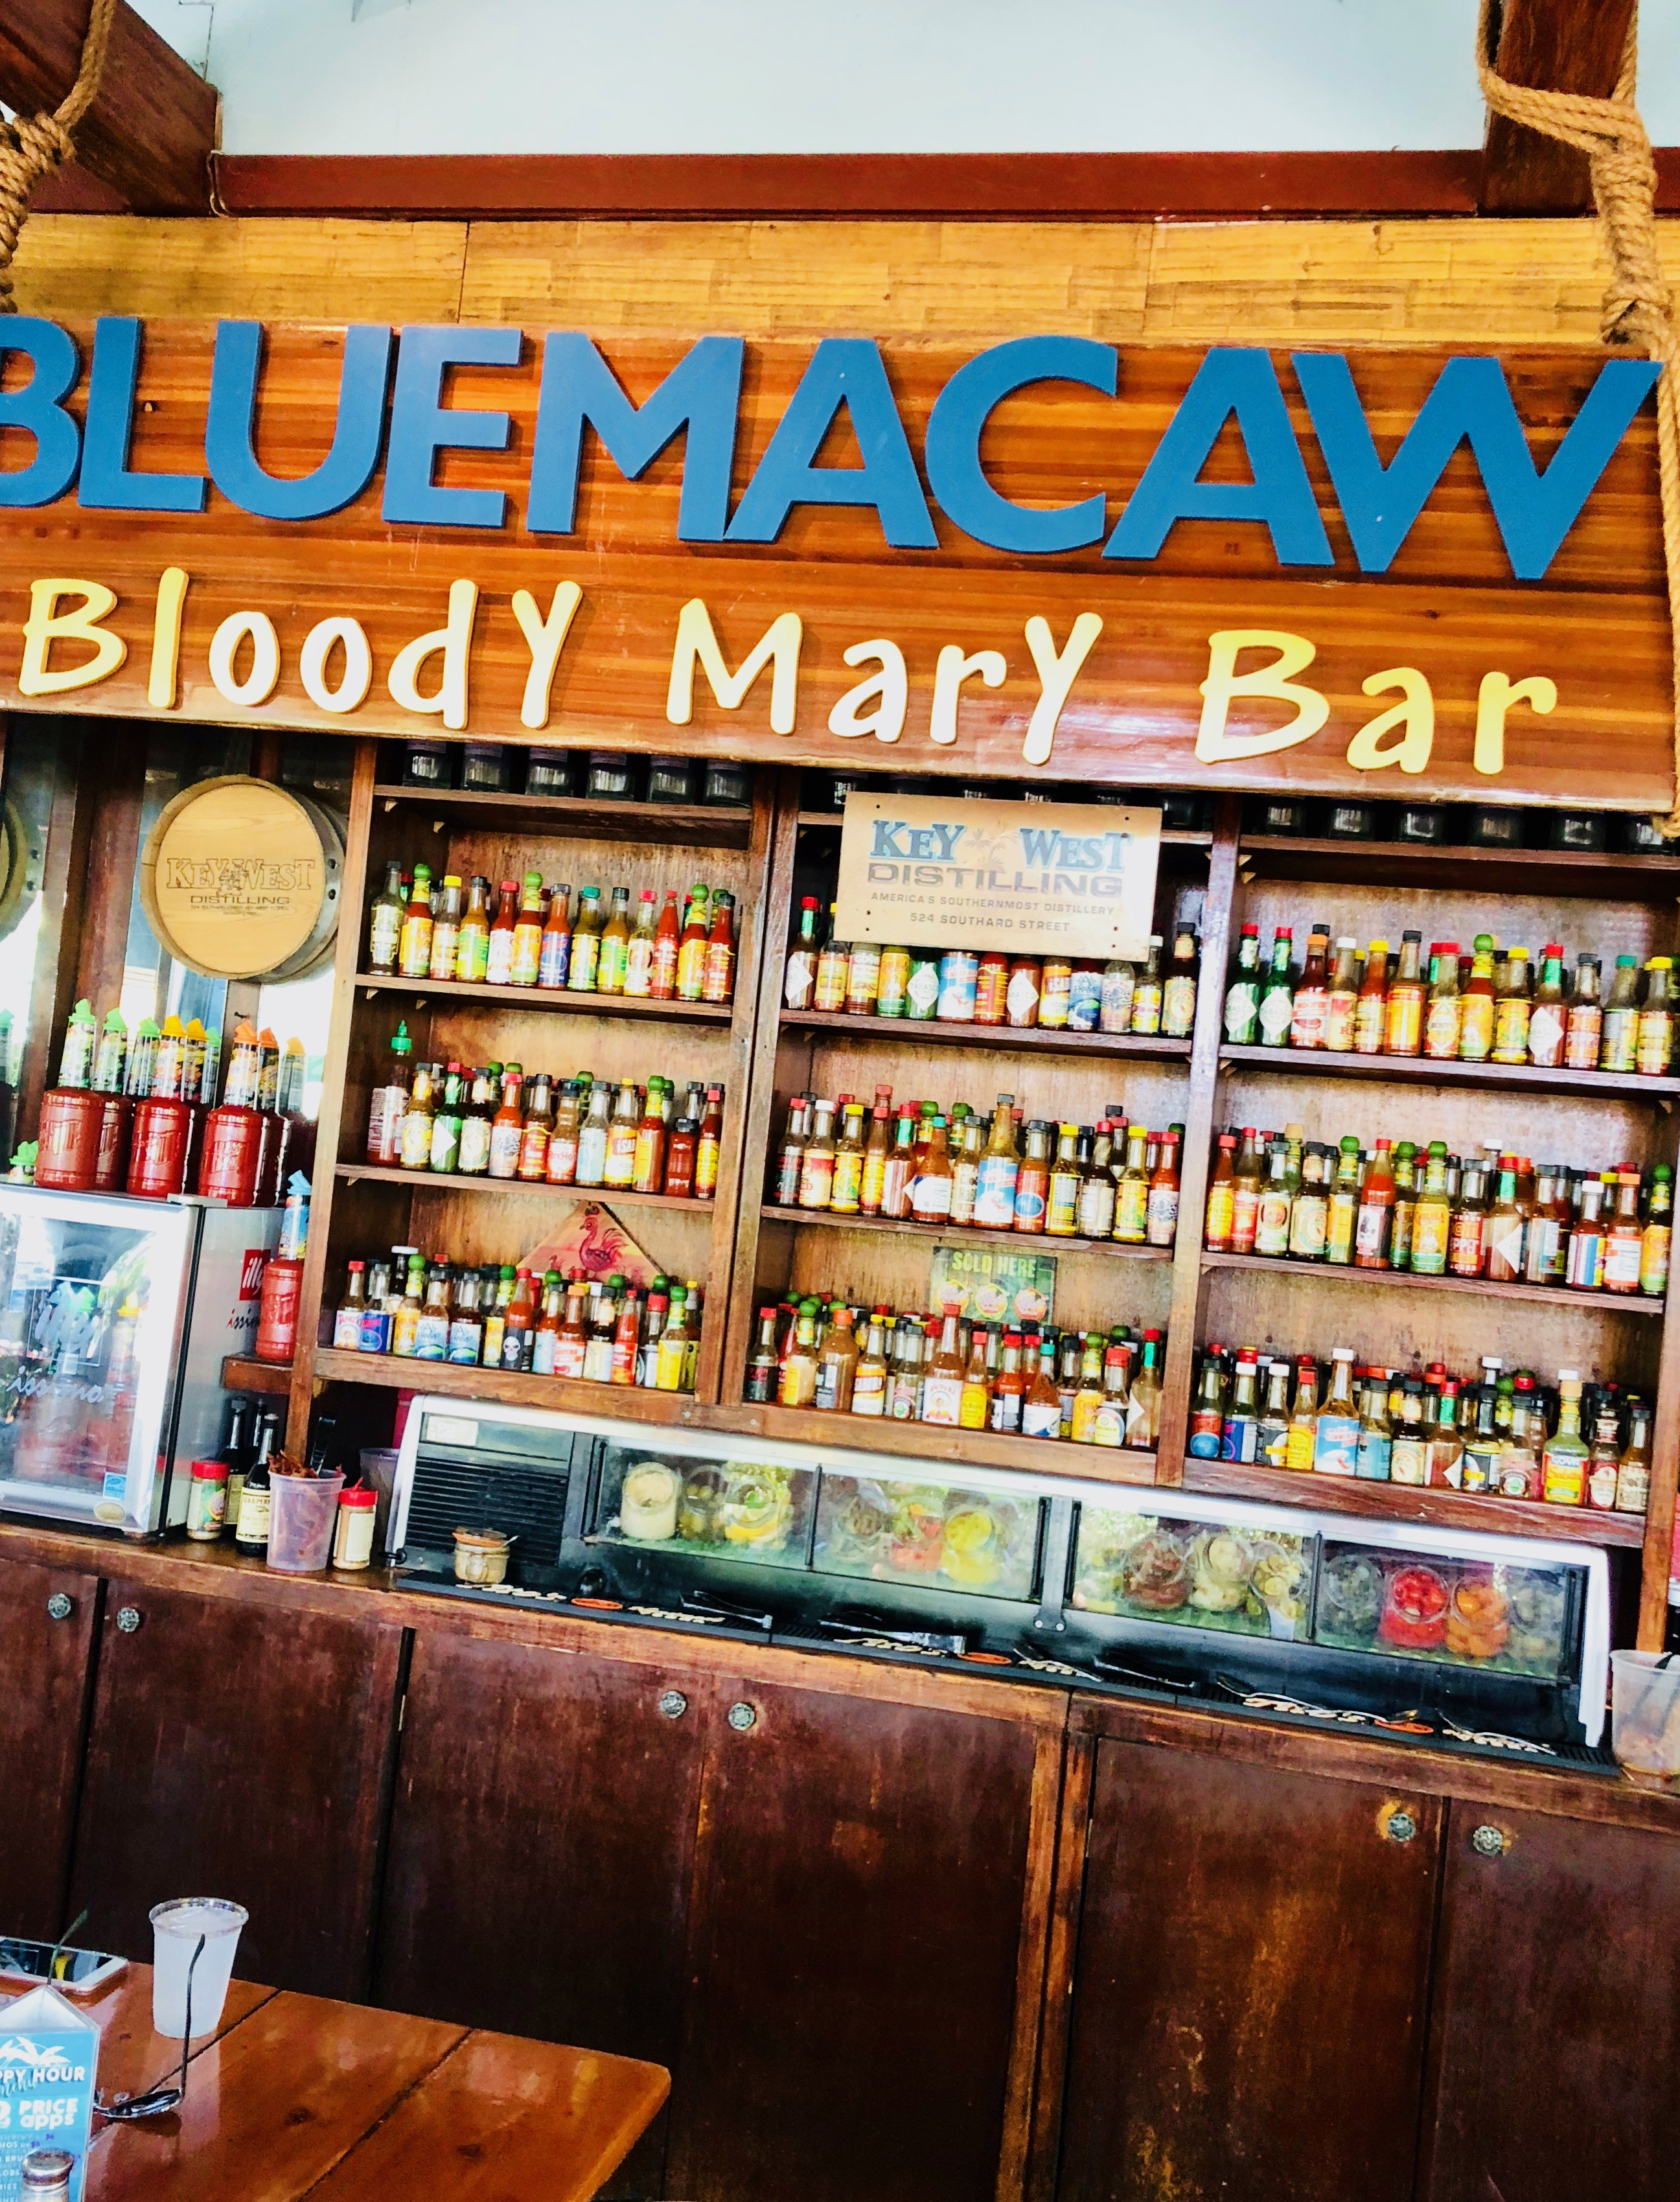 Blue Macaw Bloody Mary Bar